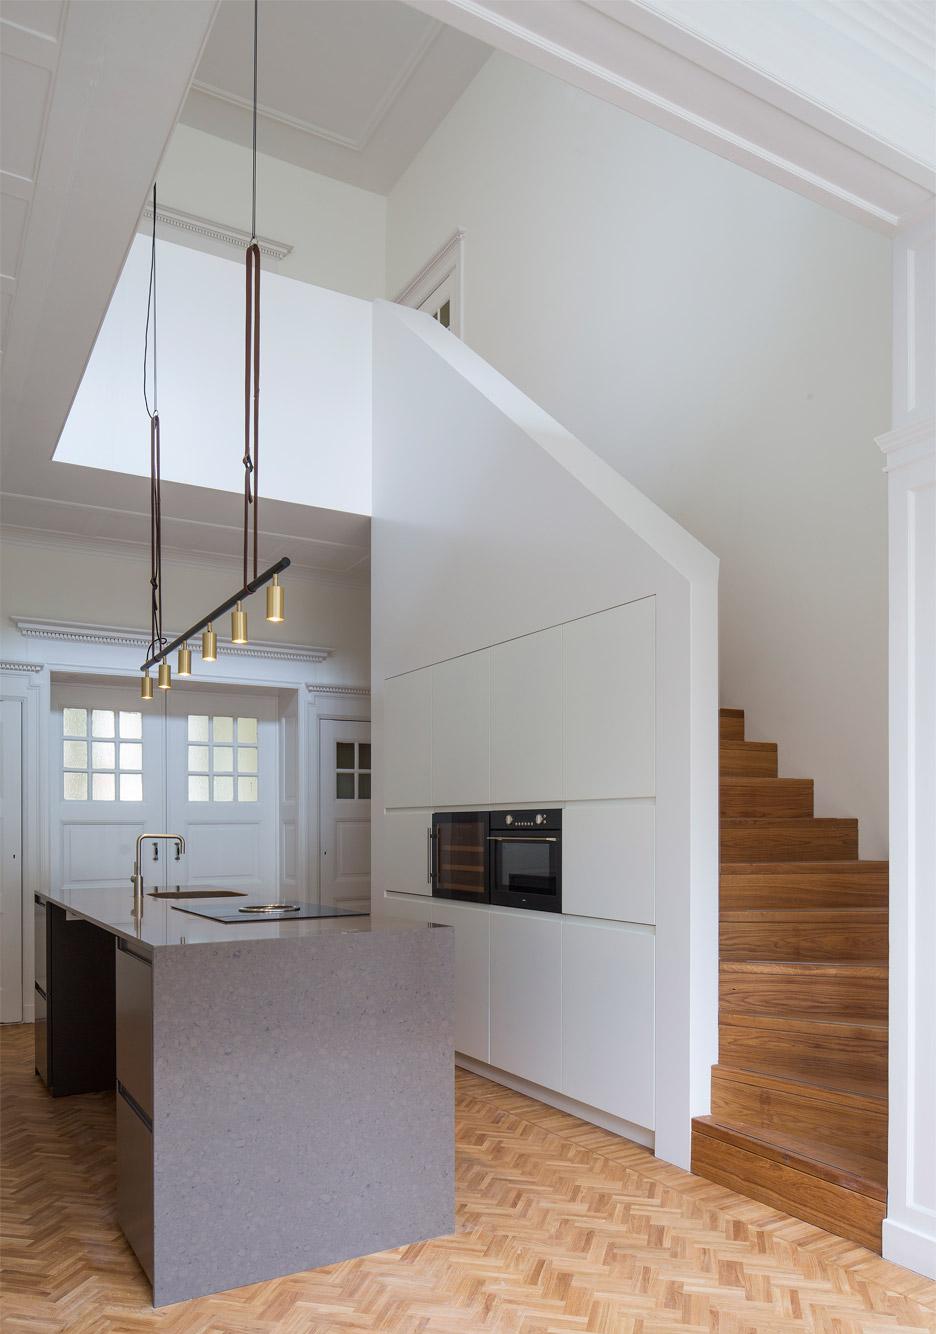 architecture_renovation_project_hague-interior_house__design_studia_interiors_osnovadesign_osnova_poltava_09